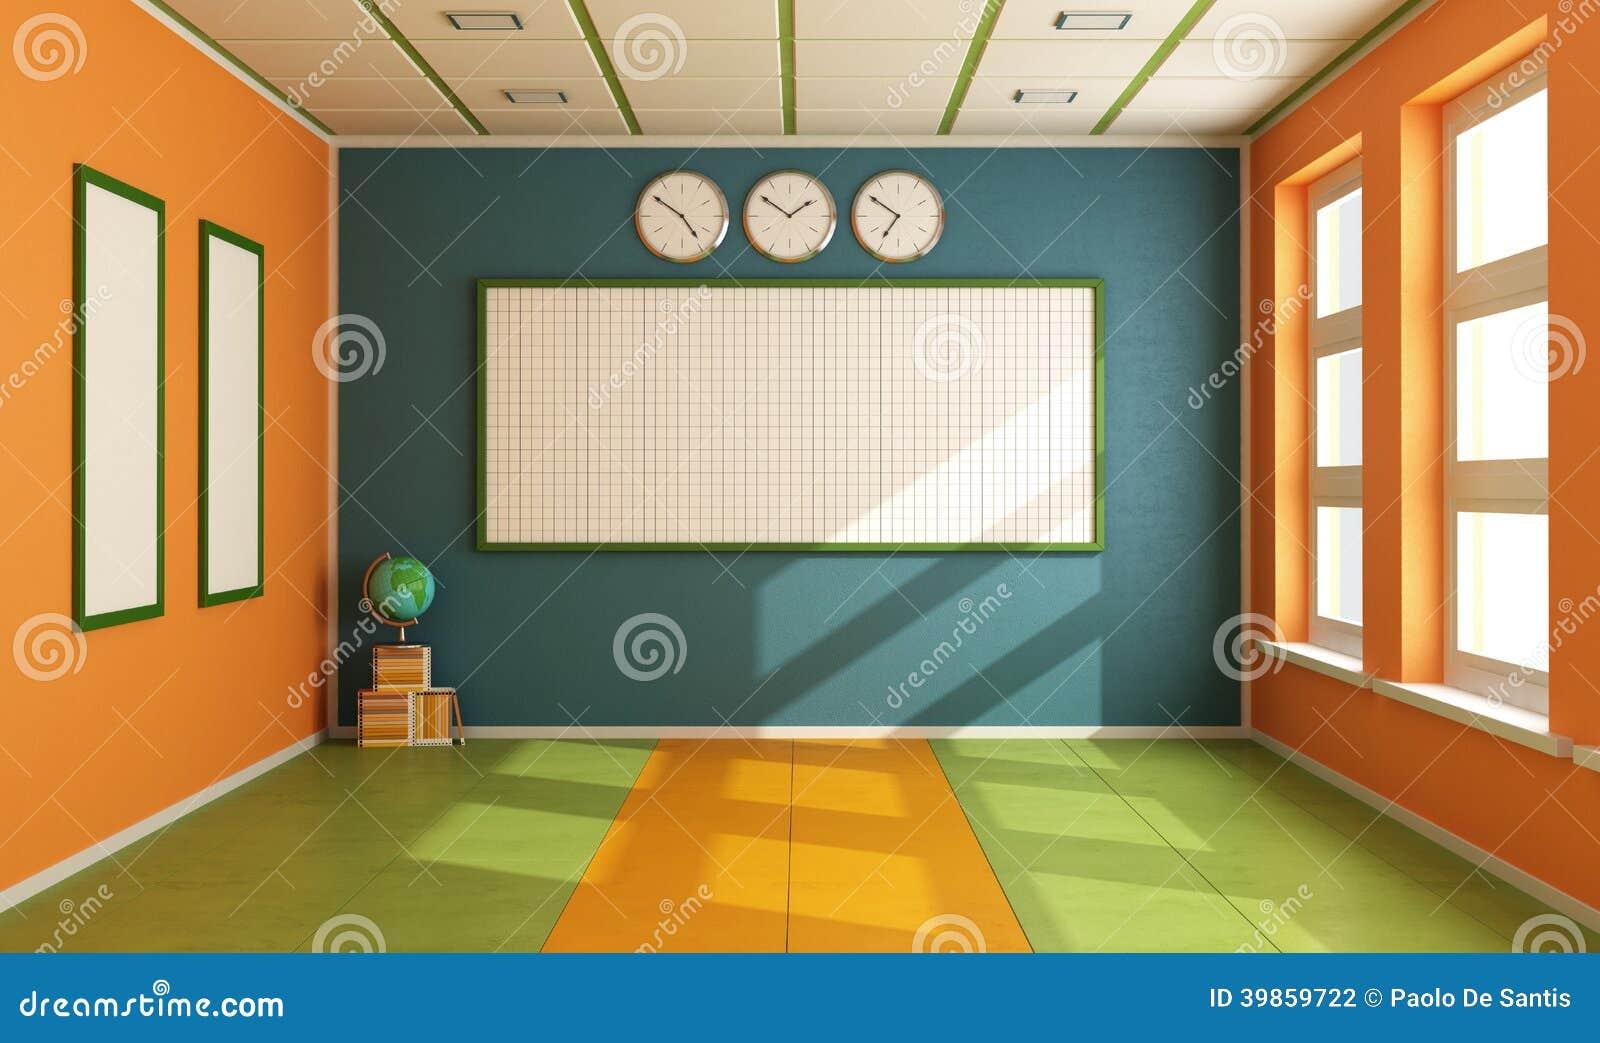 Board Room Wall Graphics